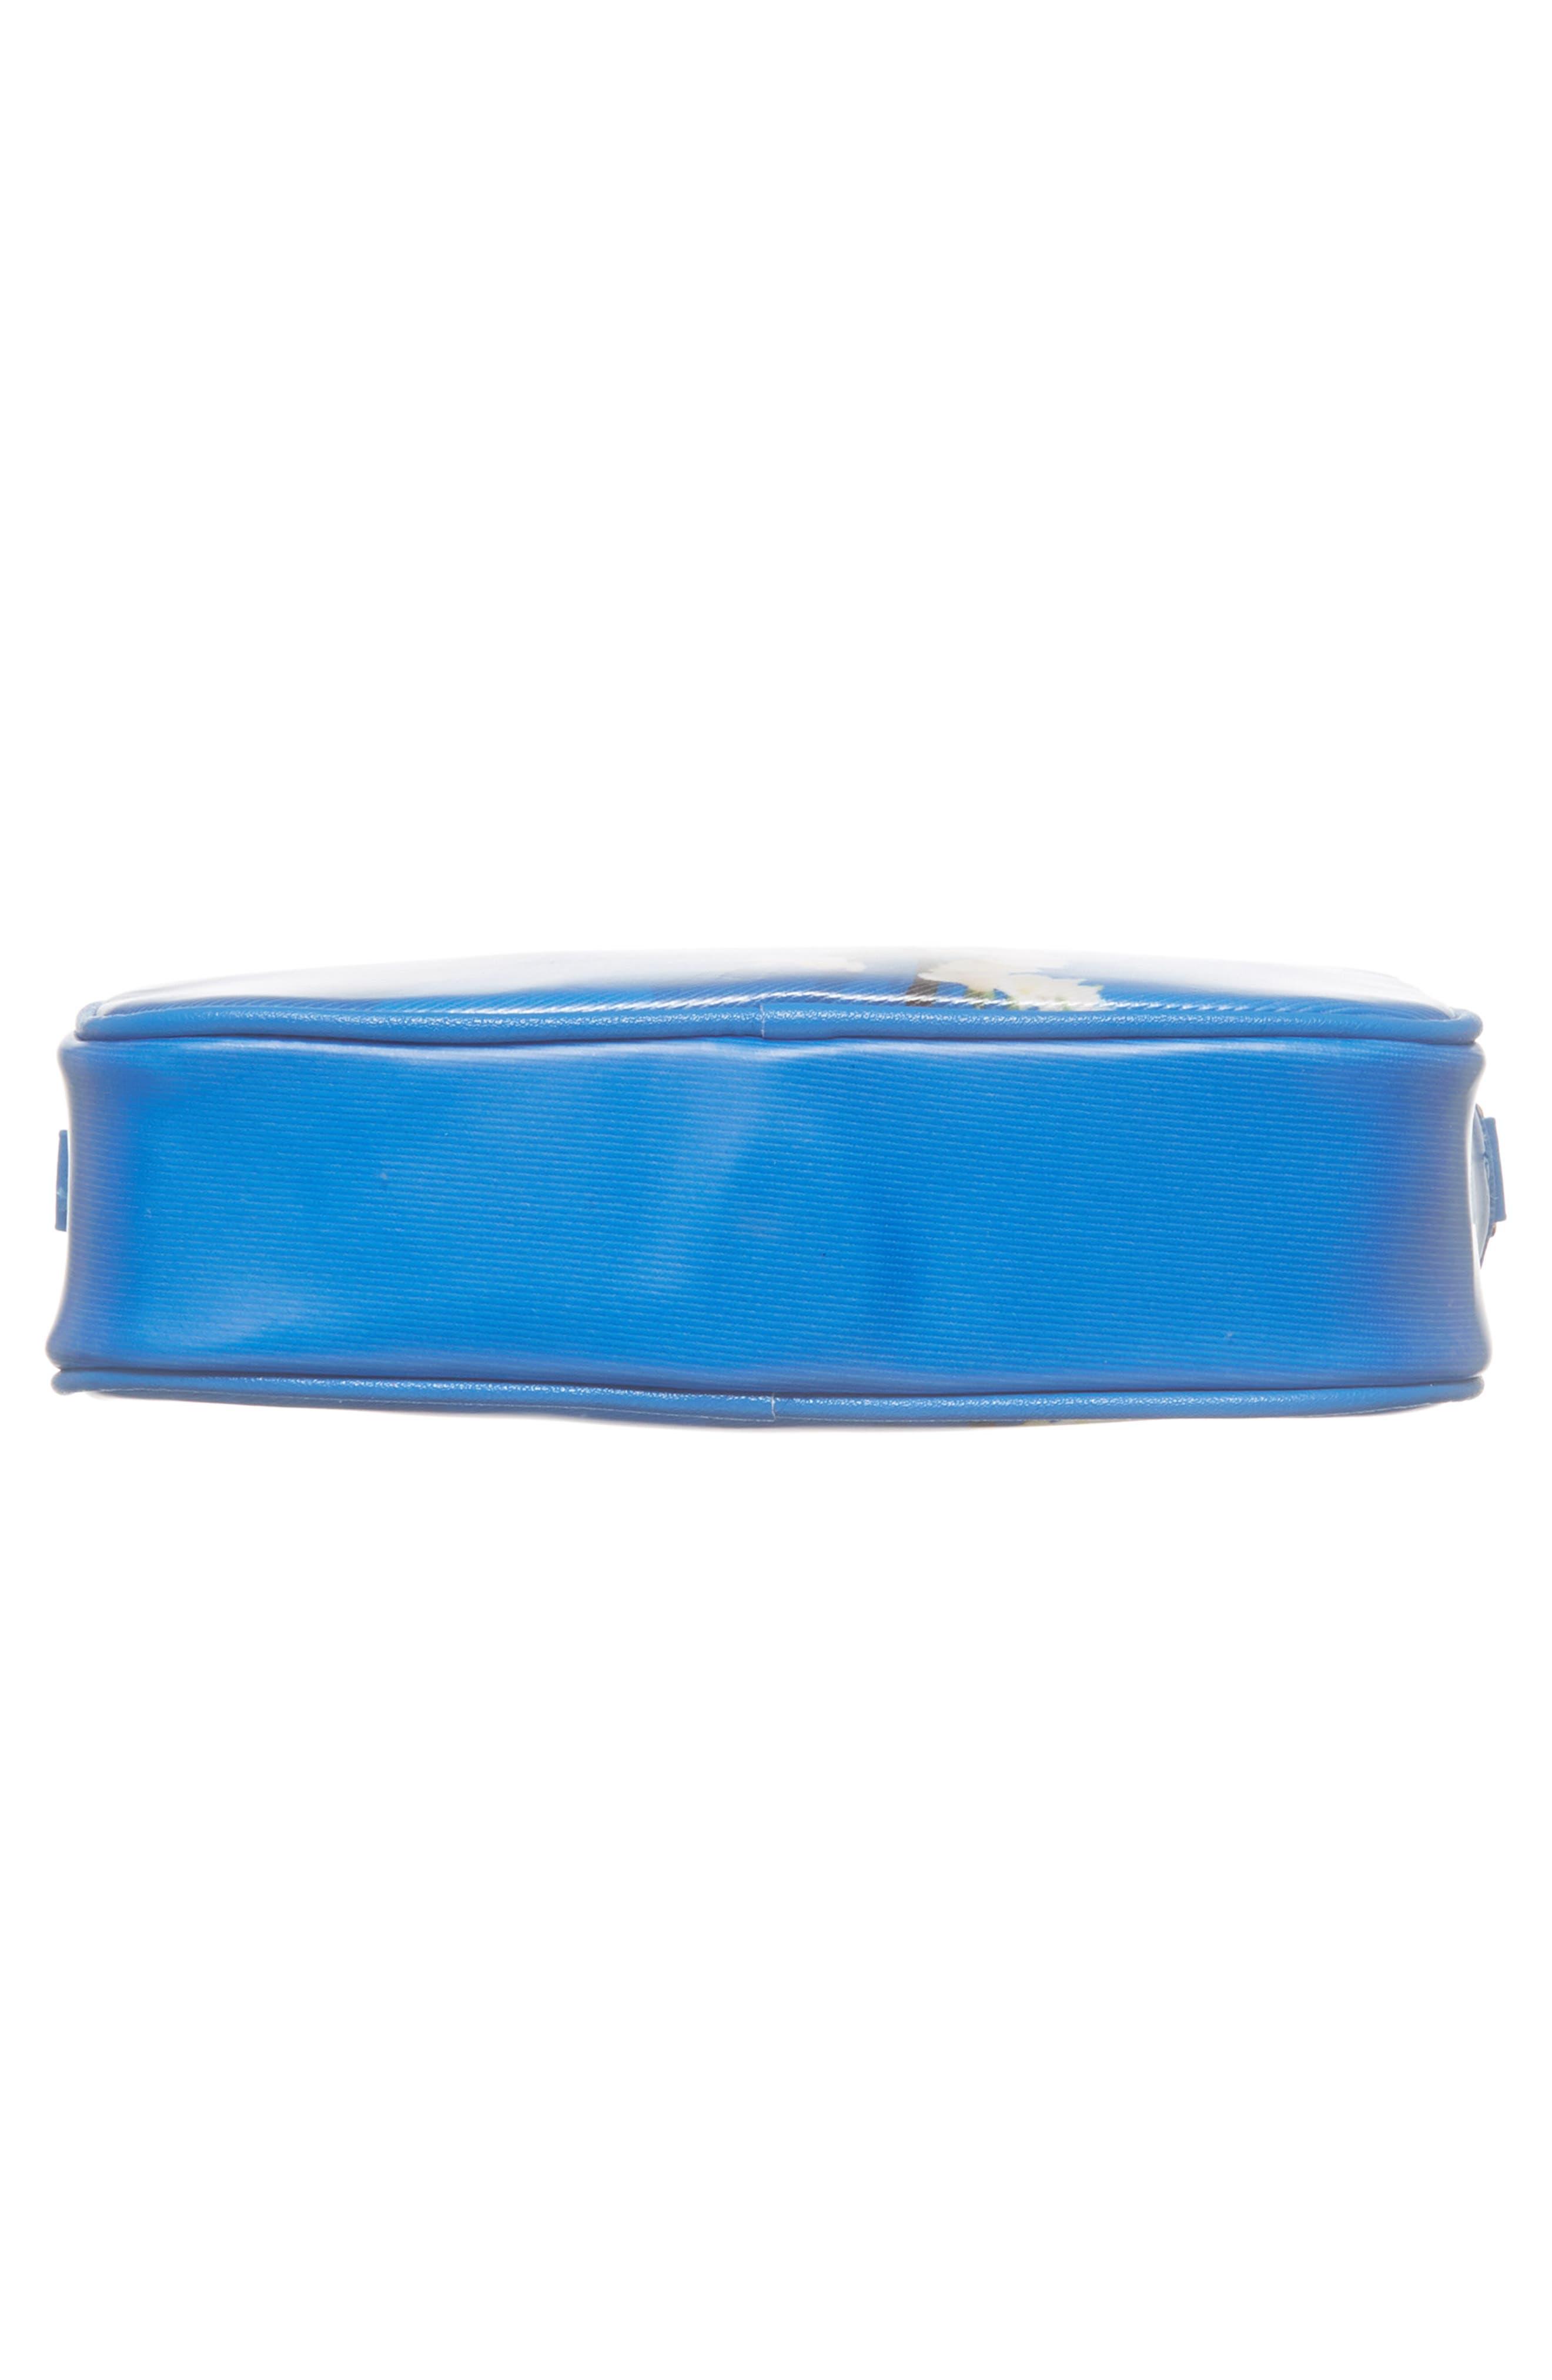 Harmony Print Canvas Camera Bag,                             Alternate thumbnail 6, color,                             Bright Blue